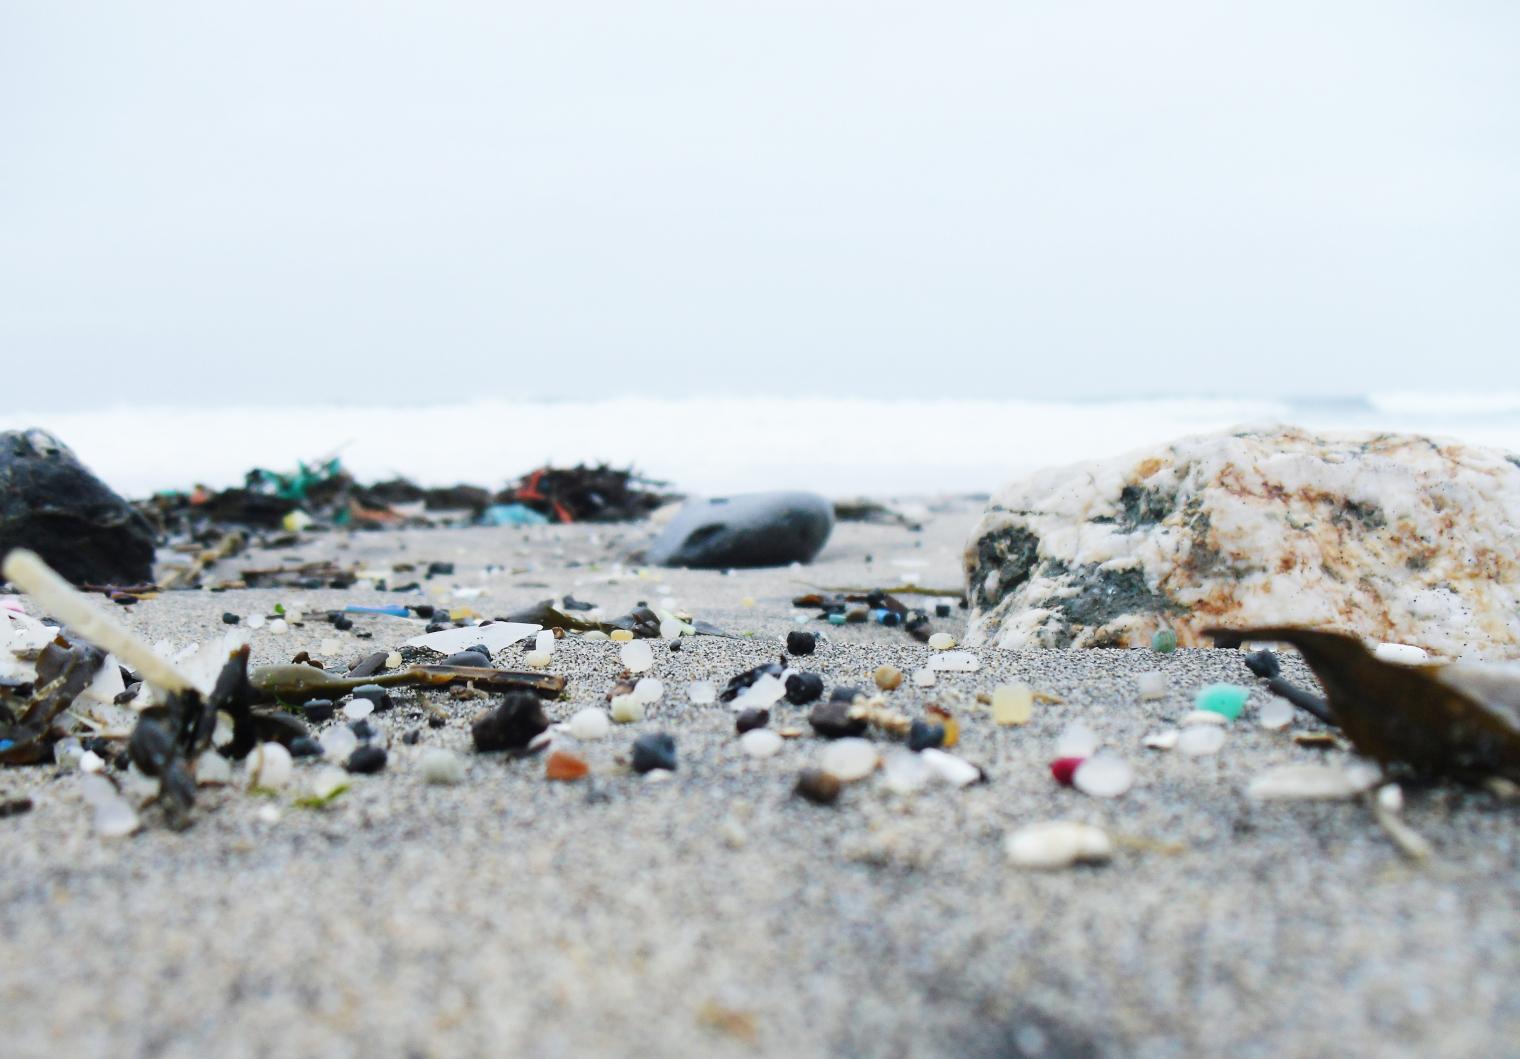 [Image caption] Microplastics on the beach. Image by    Seachair.